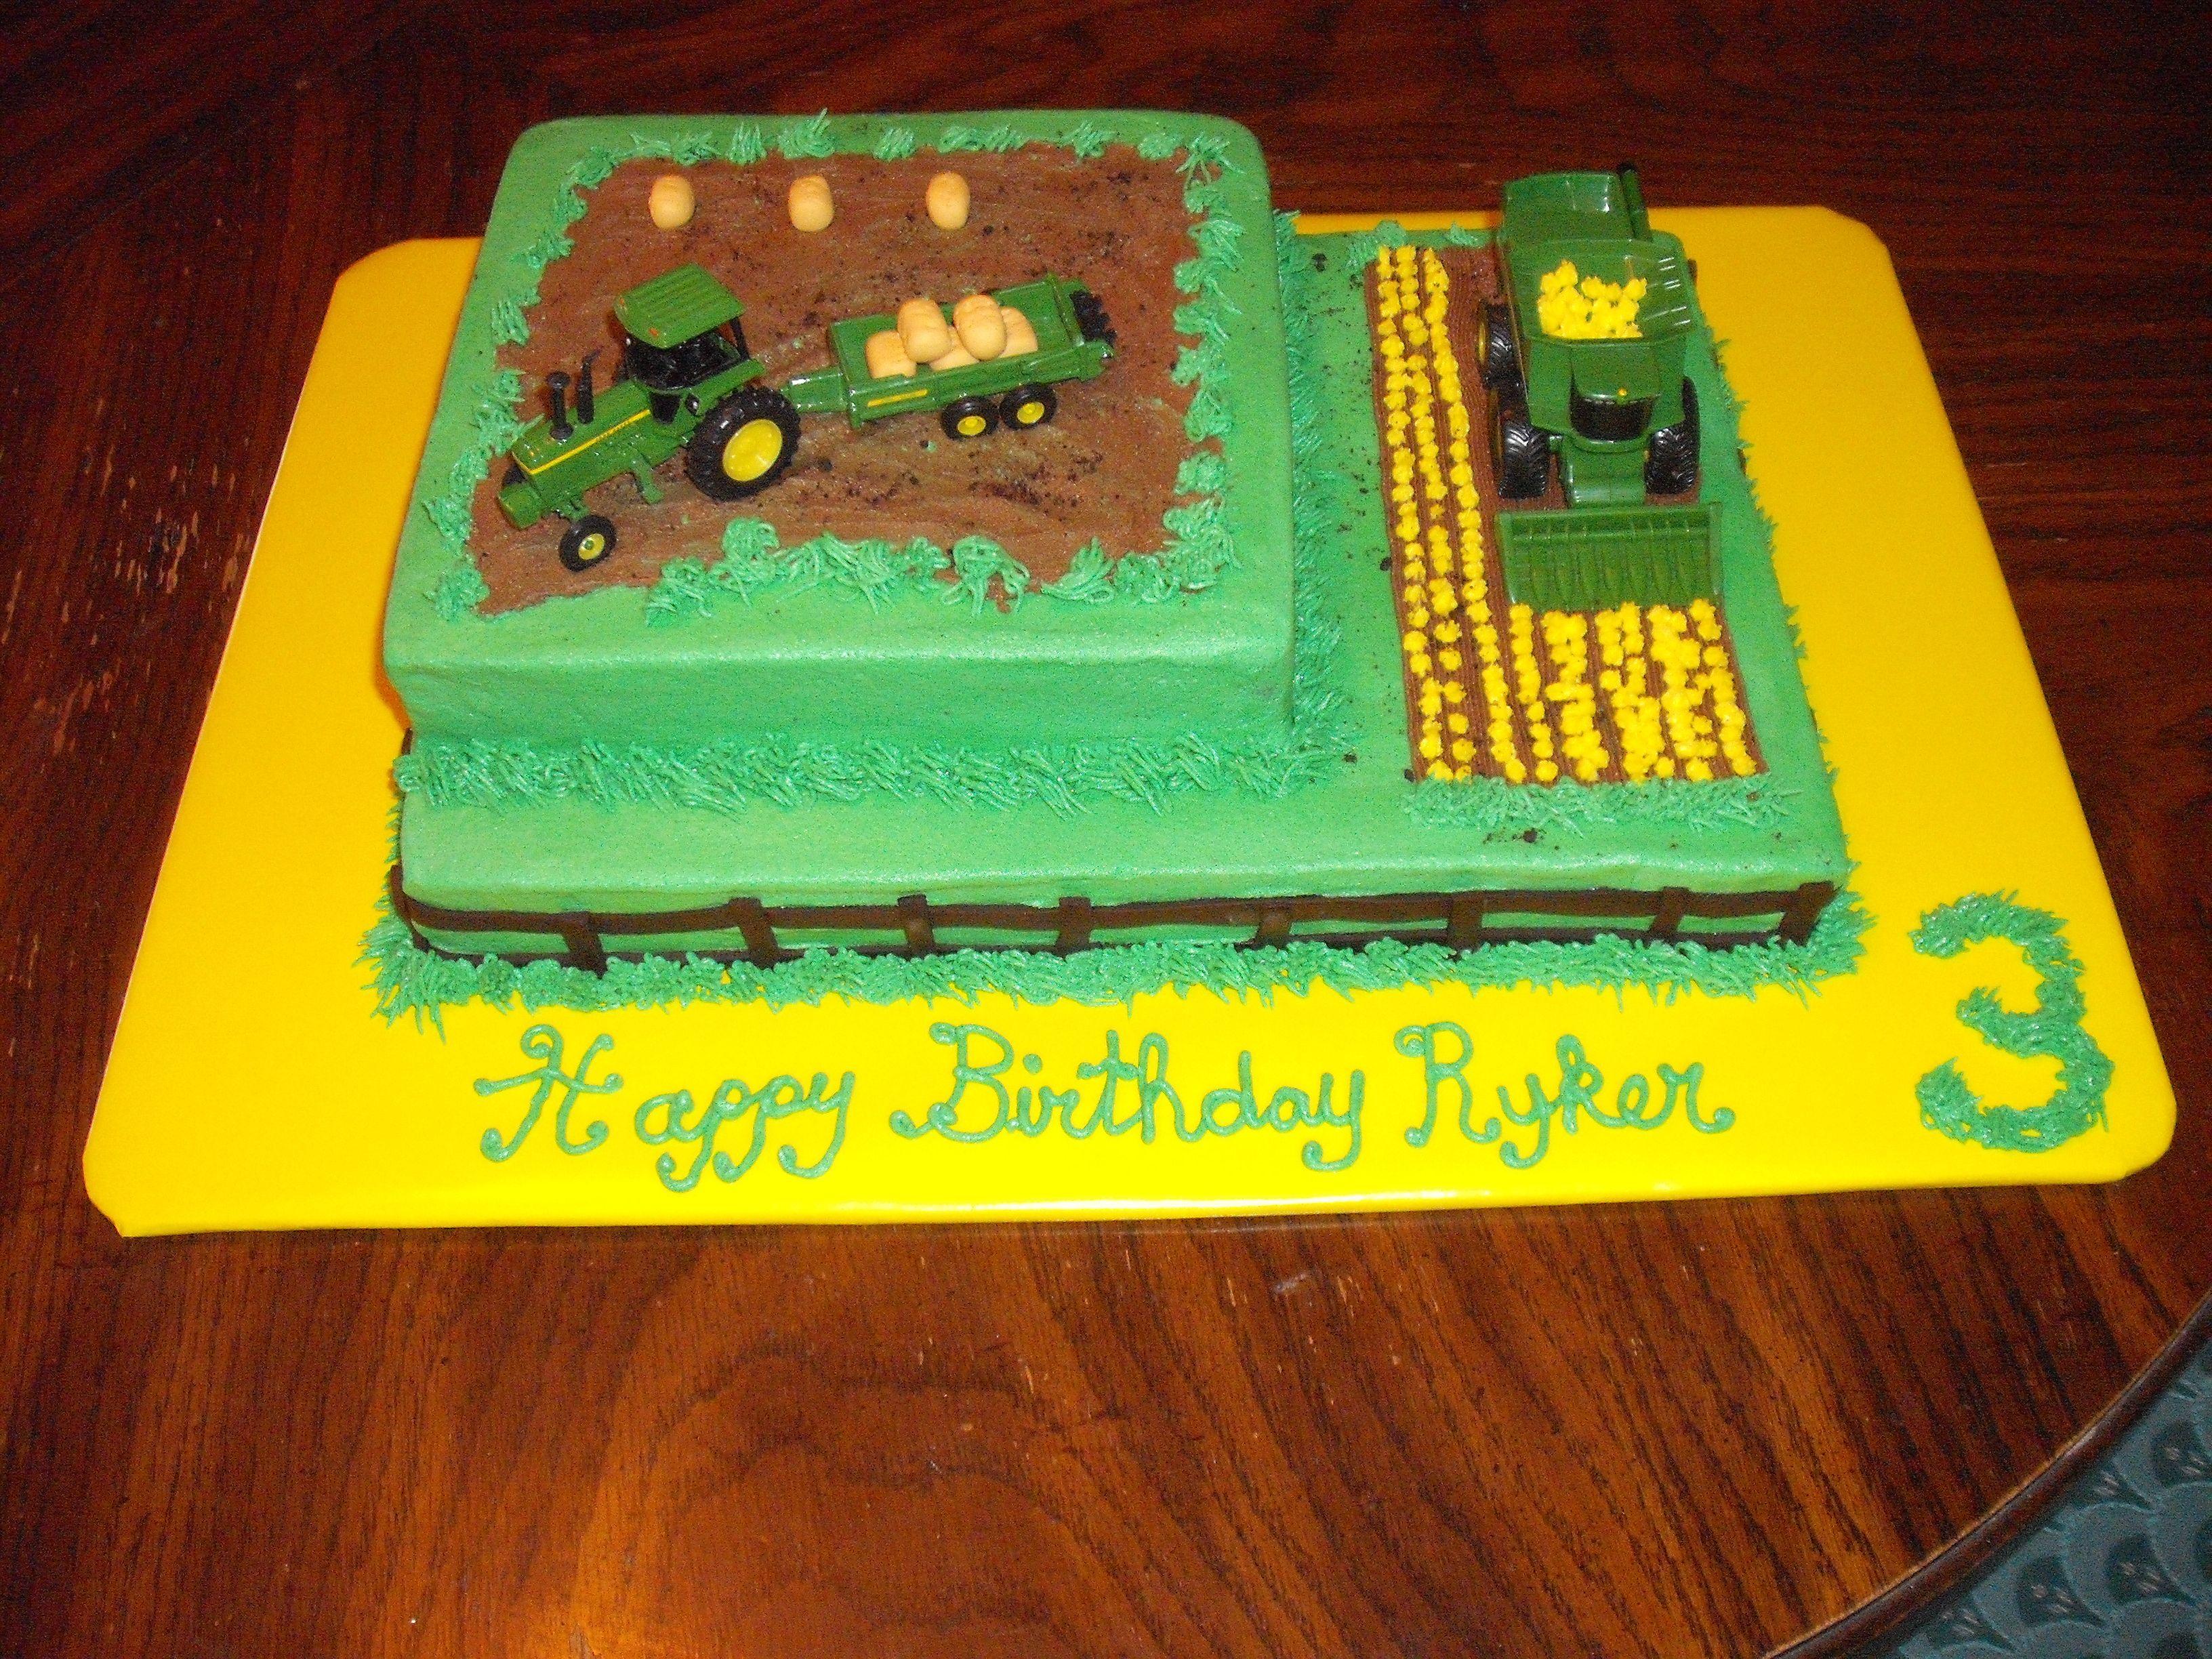 John Deere Theme Birthday Cake Complete With Tractor